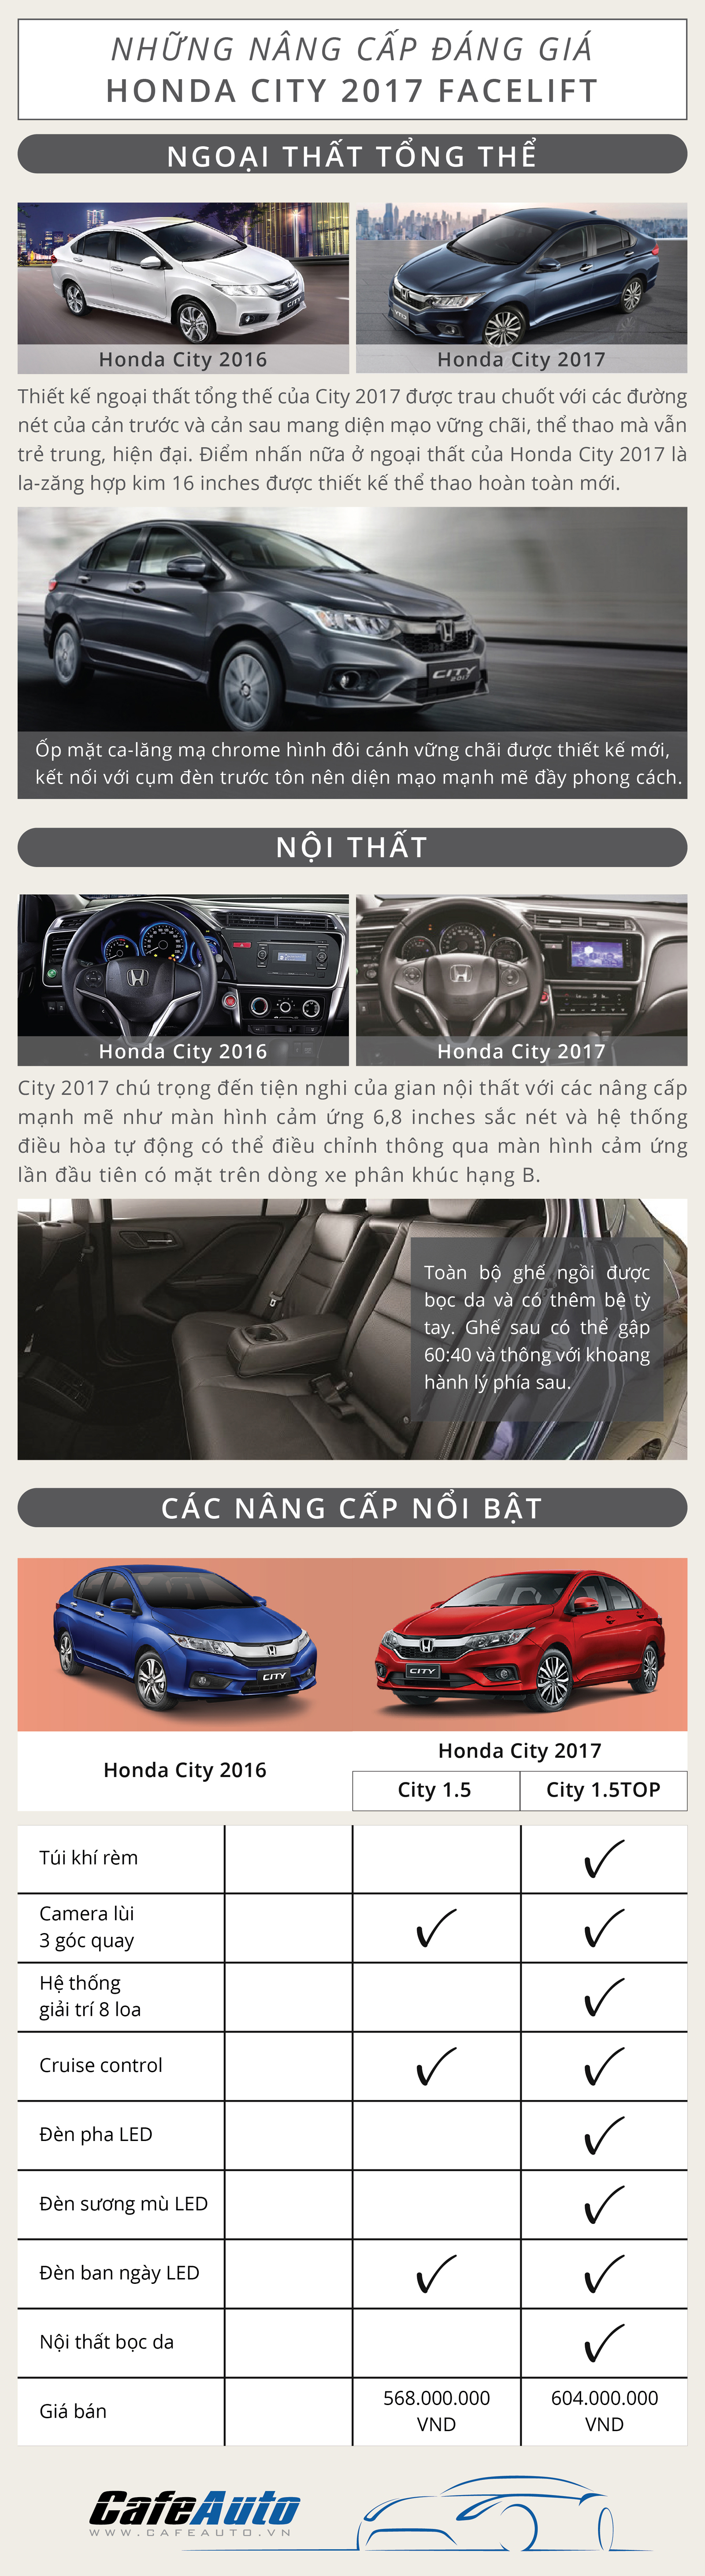 nhung-nang-cap-dang-gia-tren-honda-city-2017-facelift